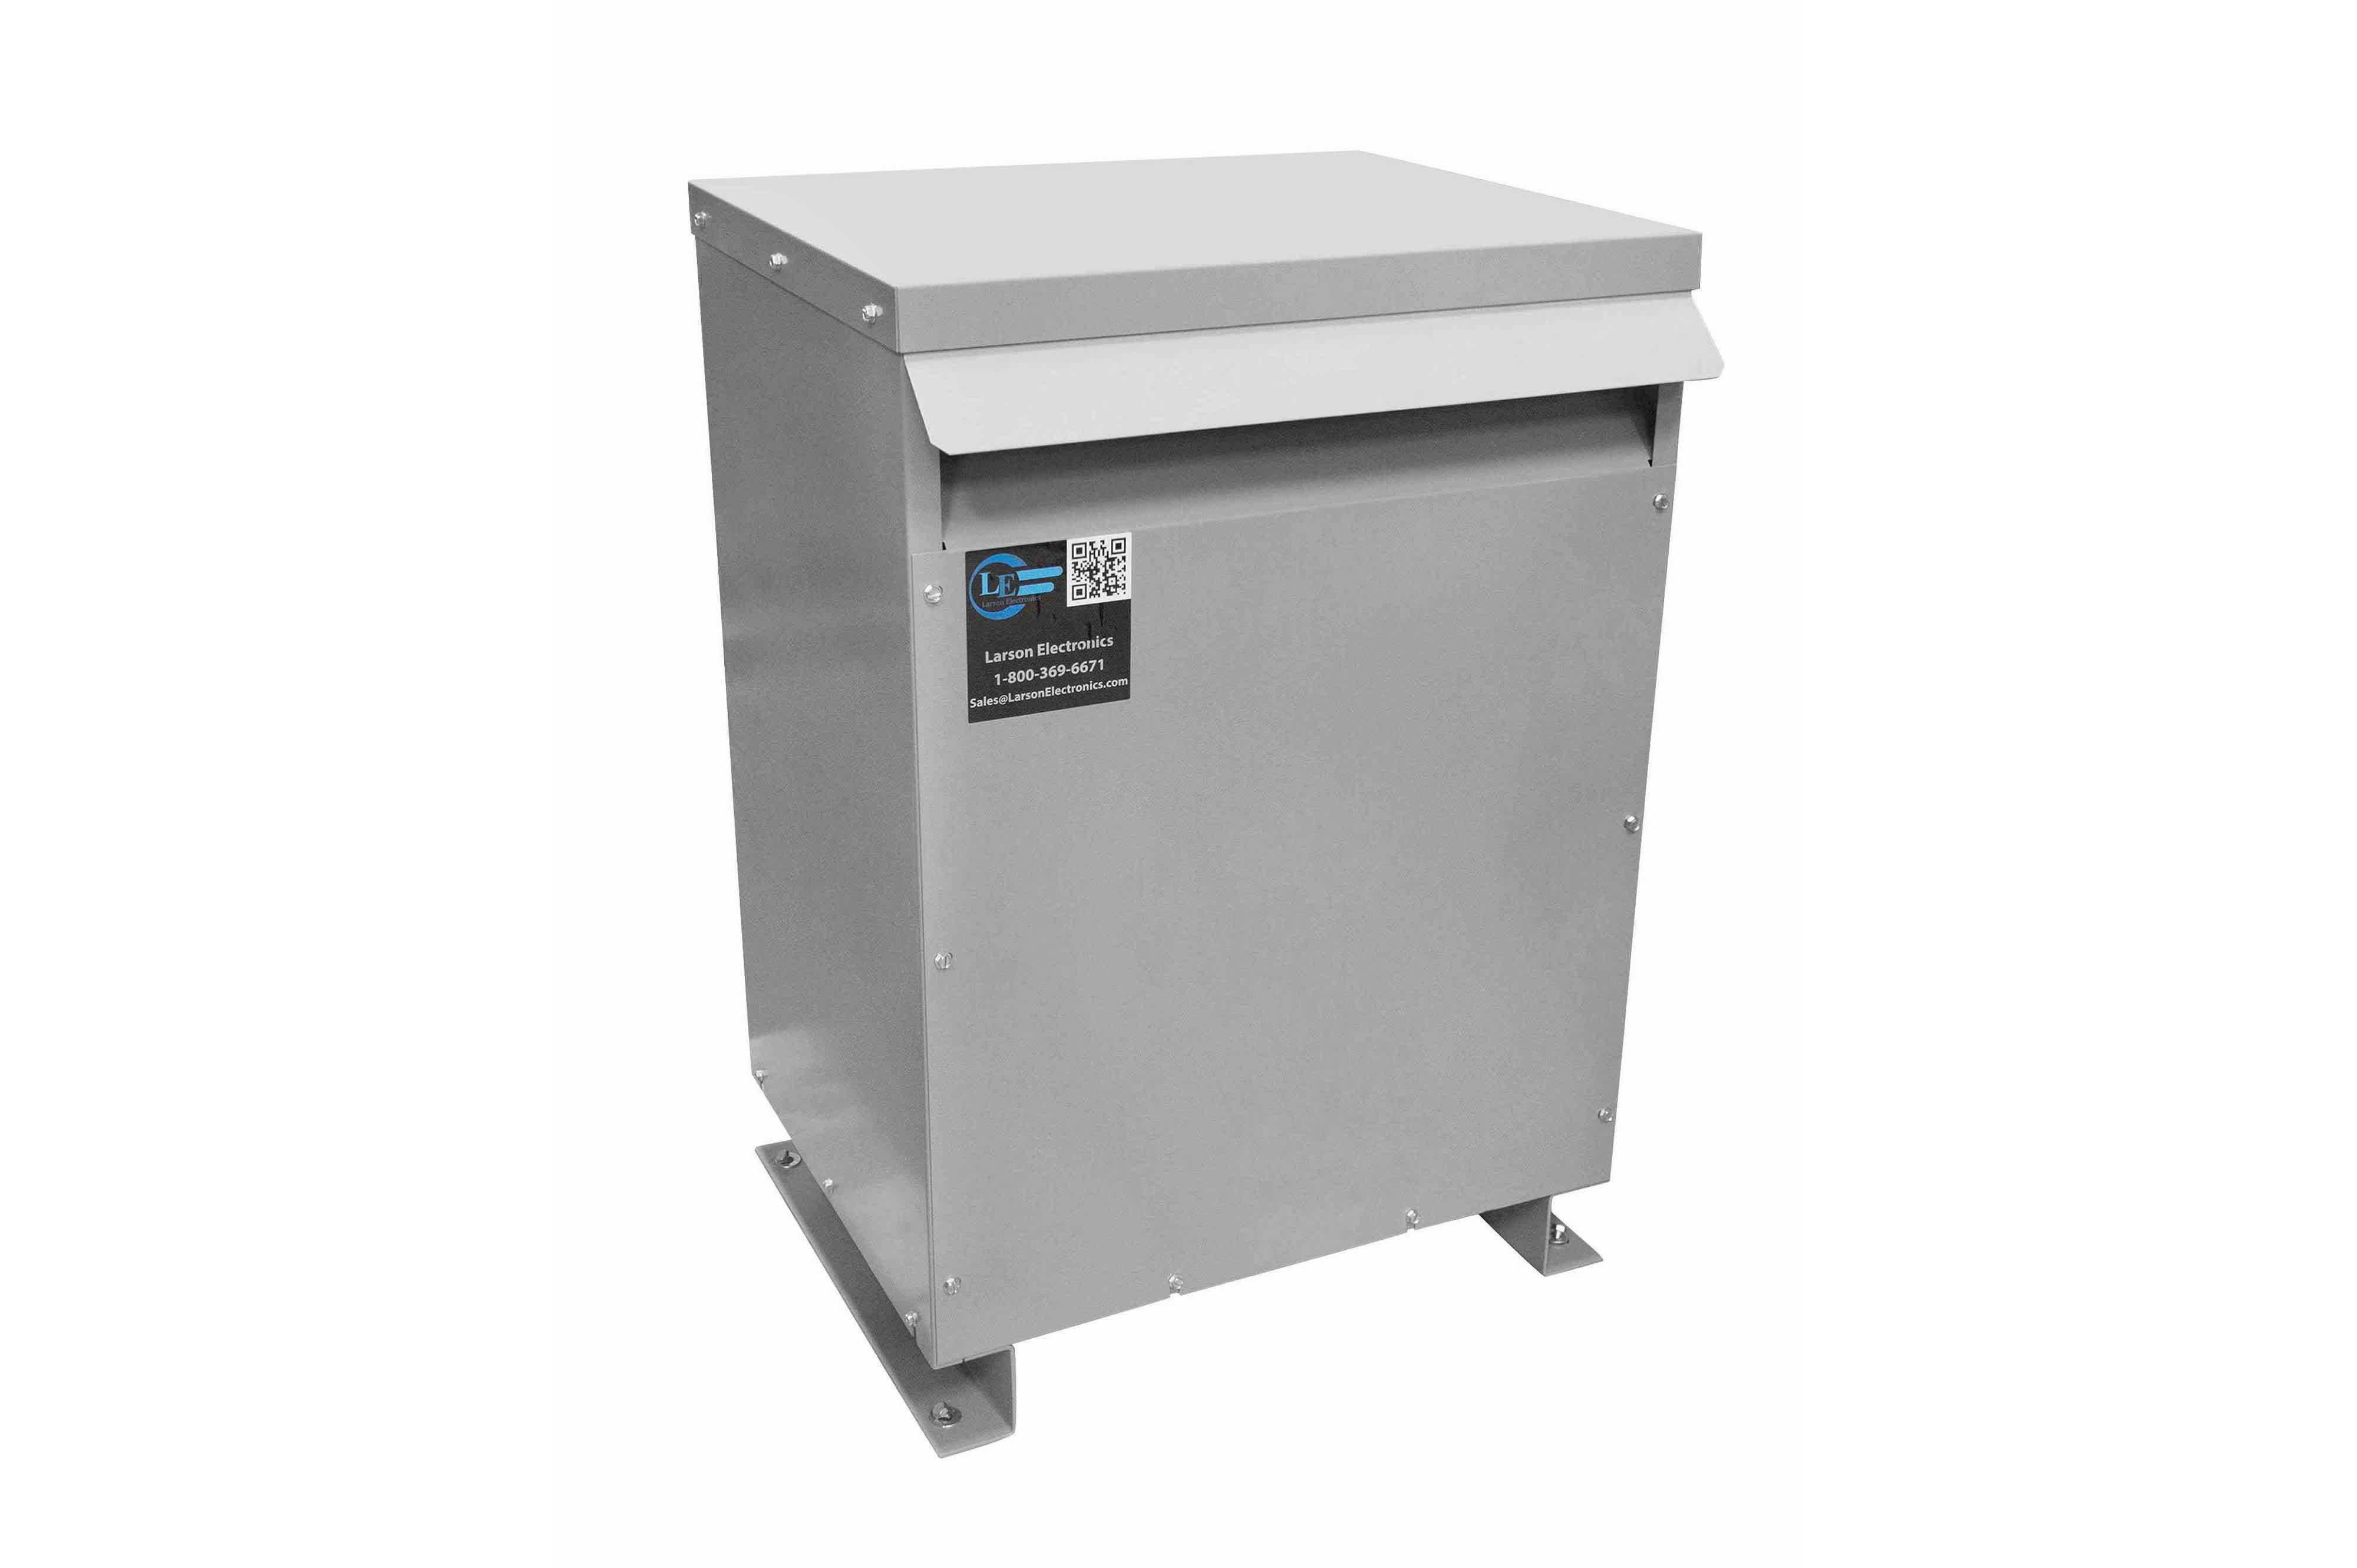 100 kVA 3PH Isolation Transformer, 220V Wye Primary, 208Y/120 Wye-N Secondary, N3R, Ventilated, 60 Hz